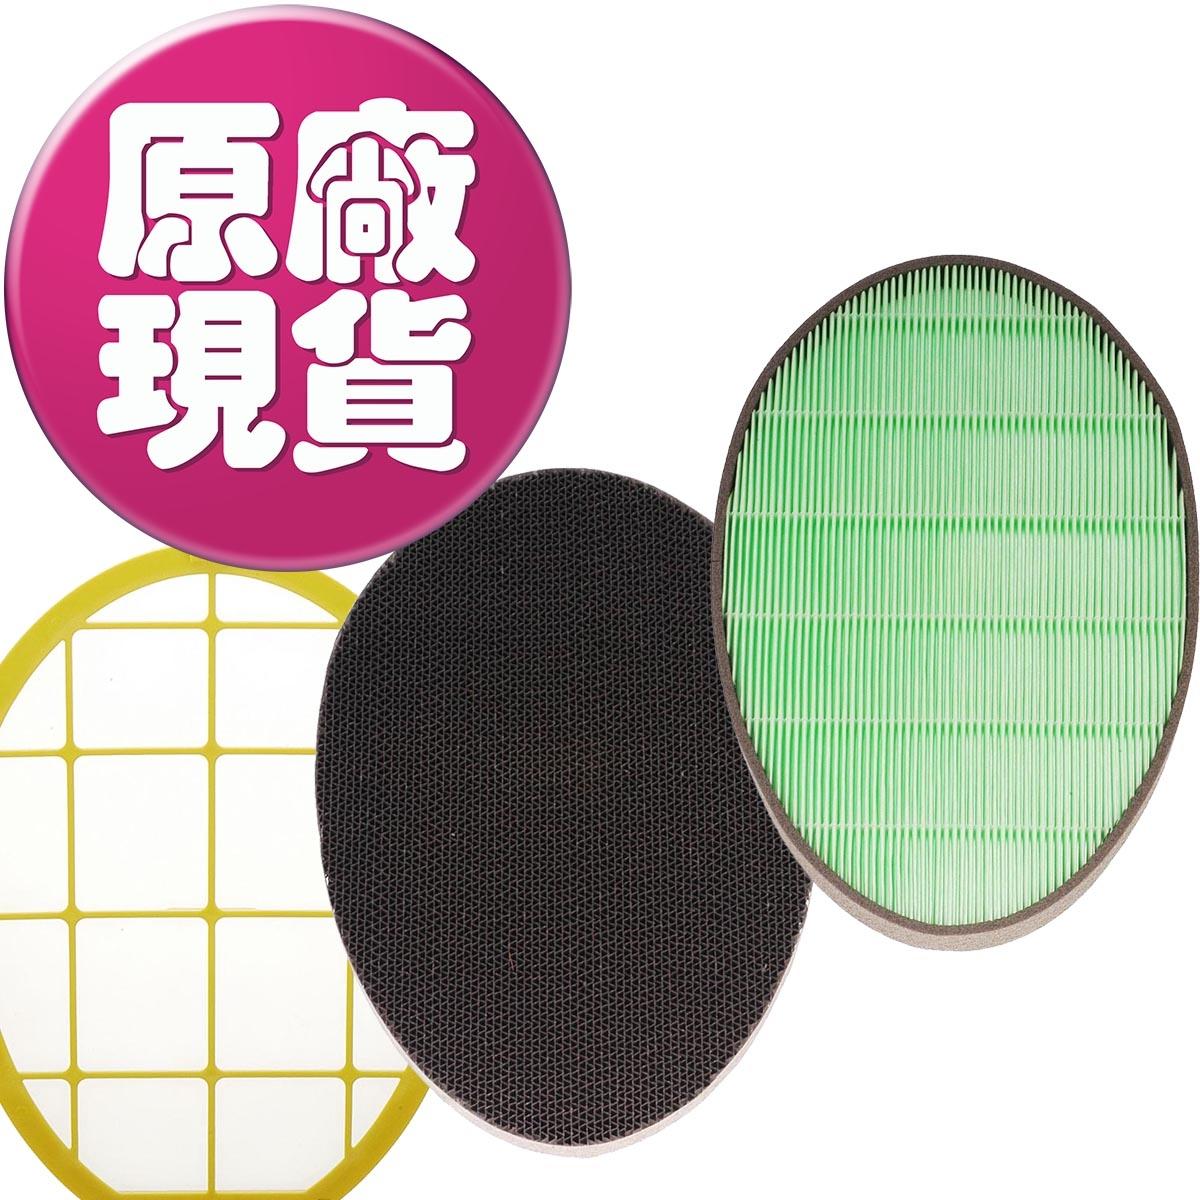 【LG耗材】PS-W309WI 超淨化大白 空氣清淨機 全配濾網組合包